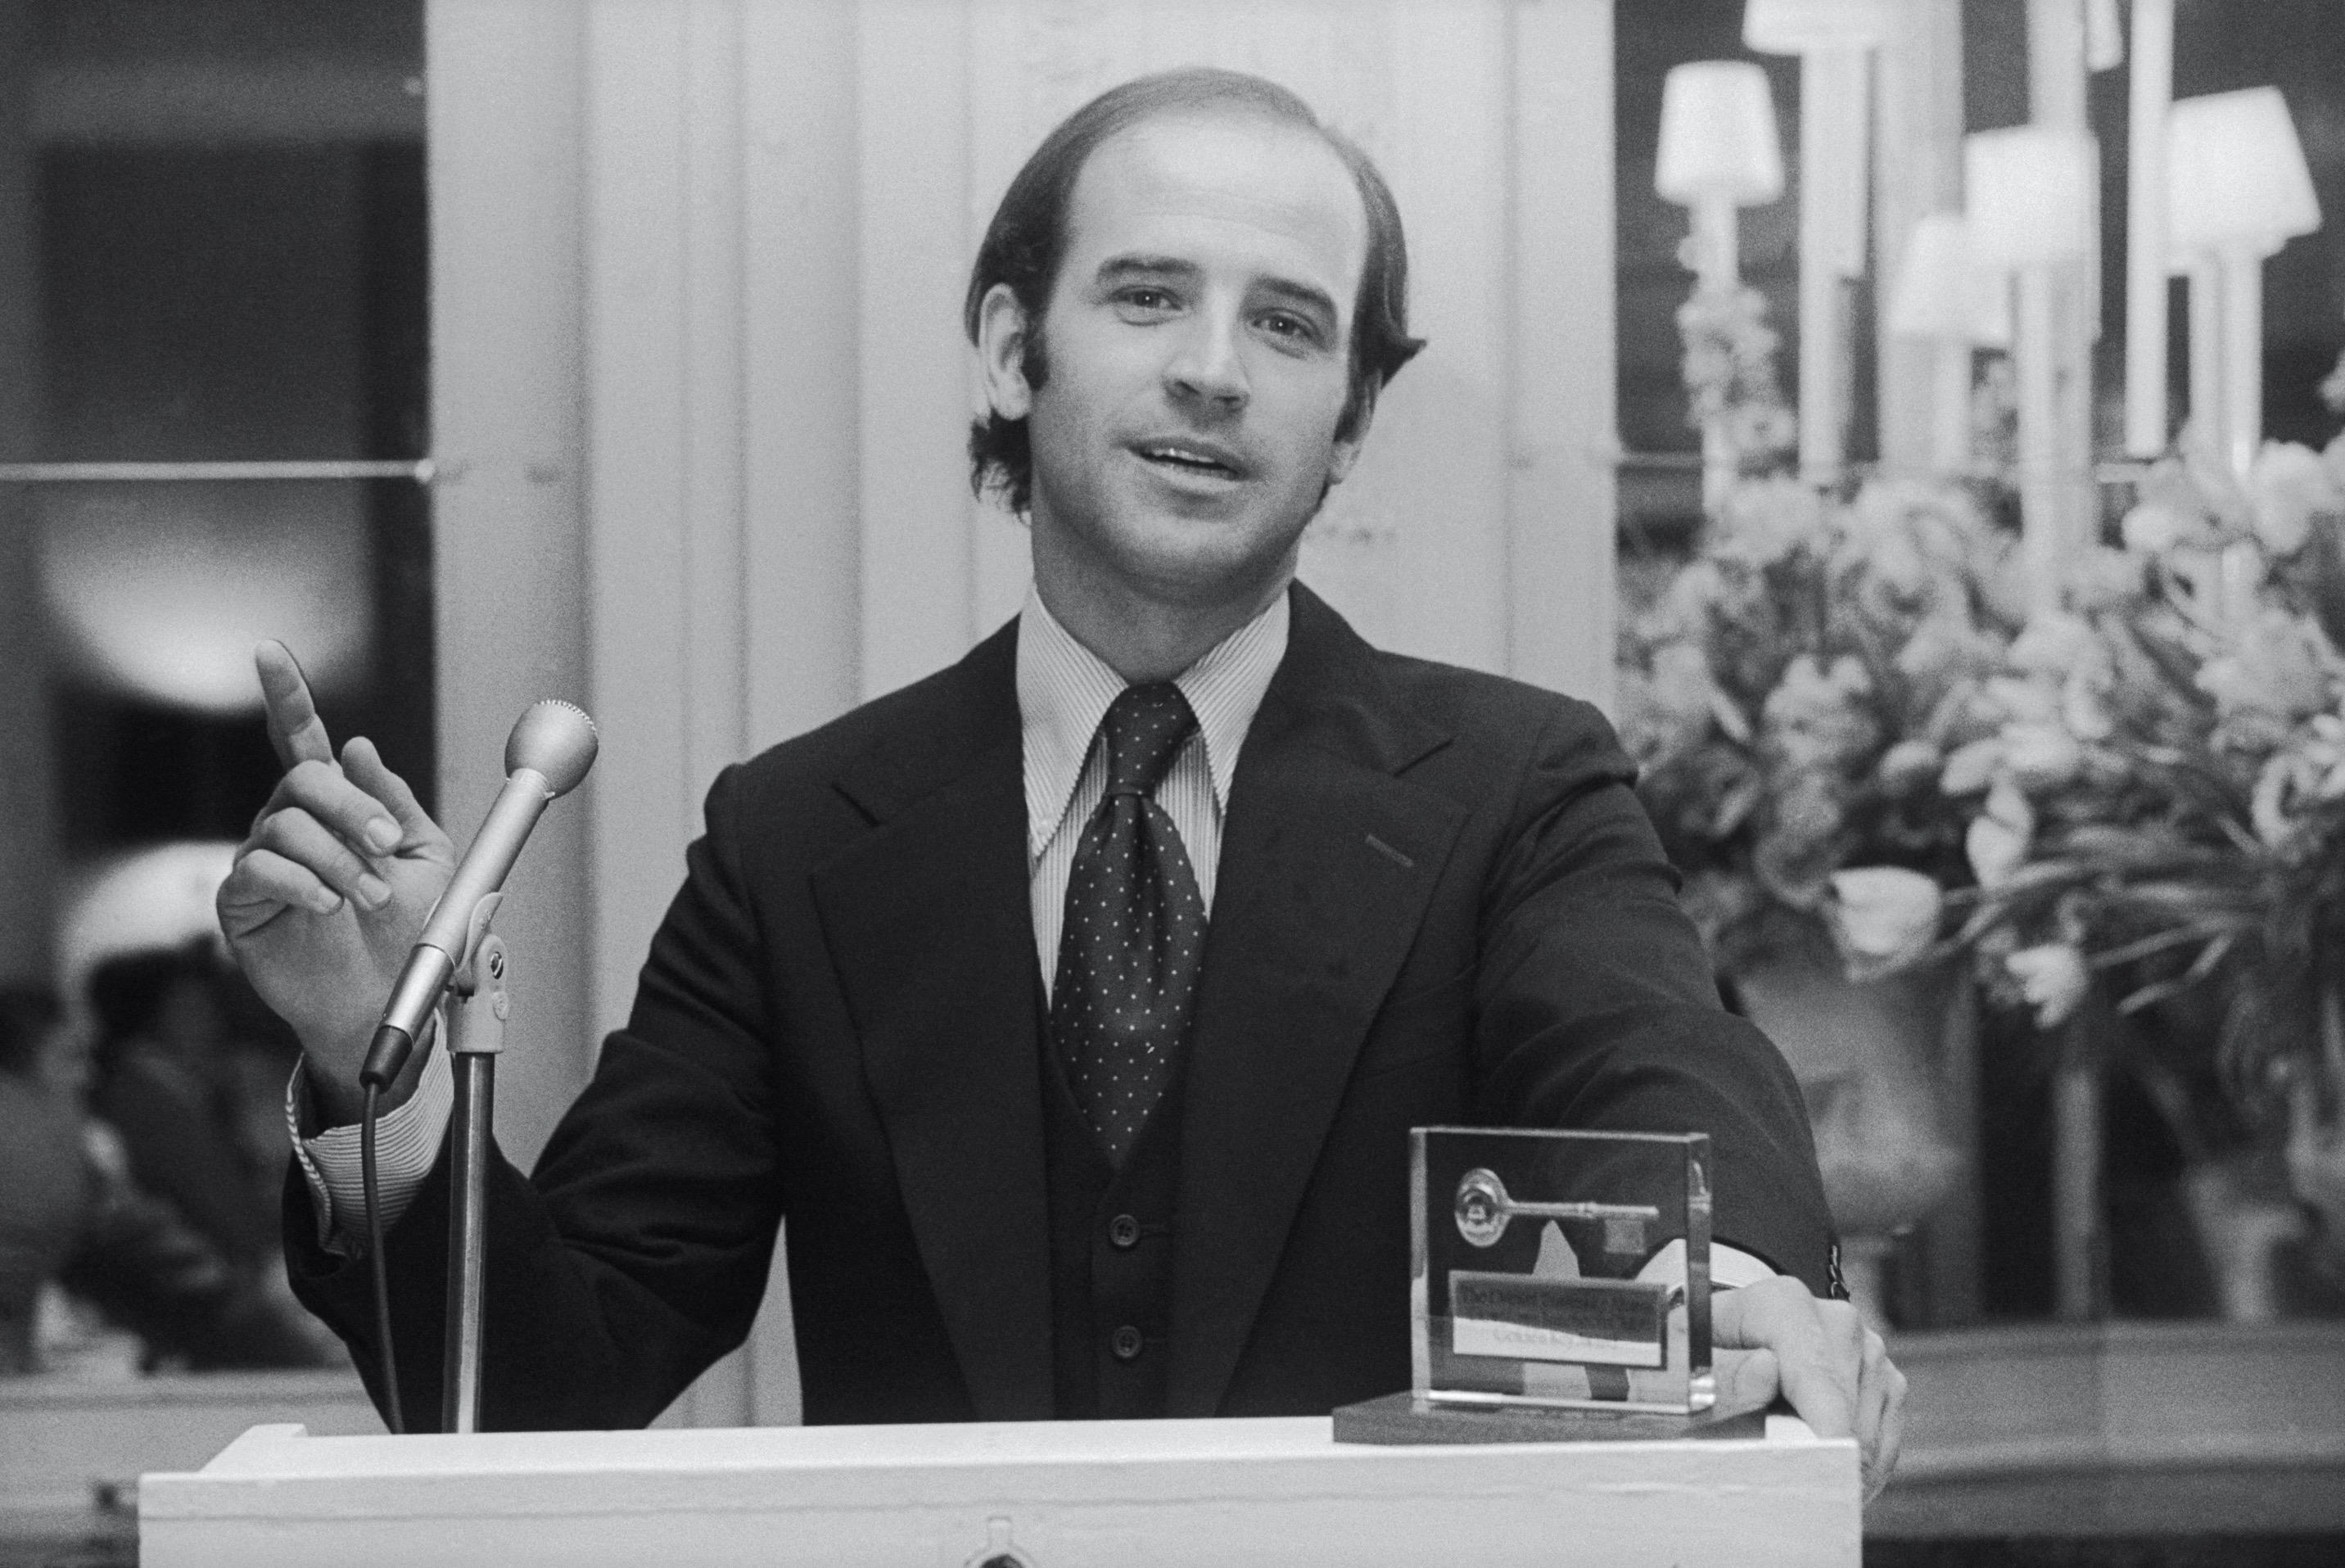 'Joe Biden Reeks of Decency'